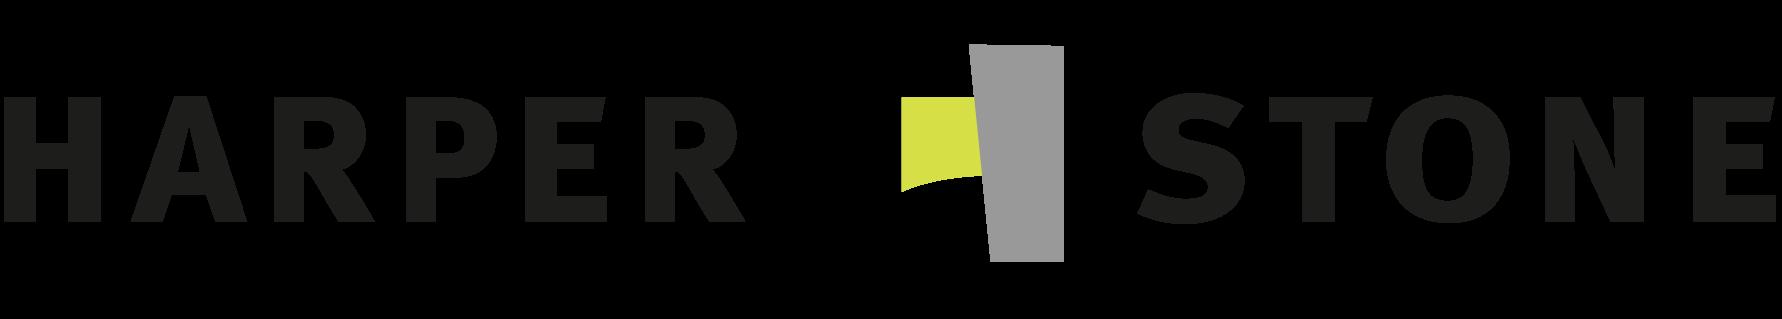 harper stone logo